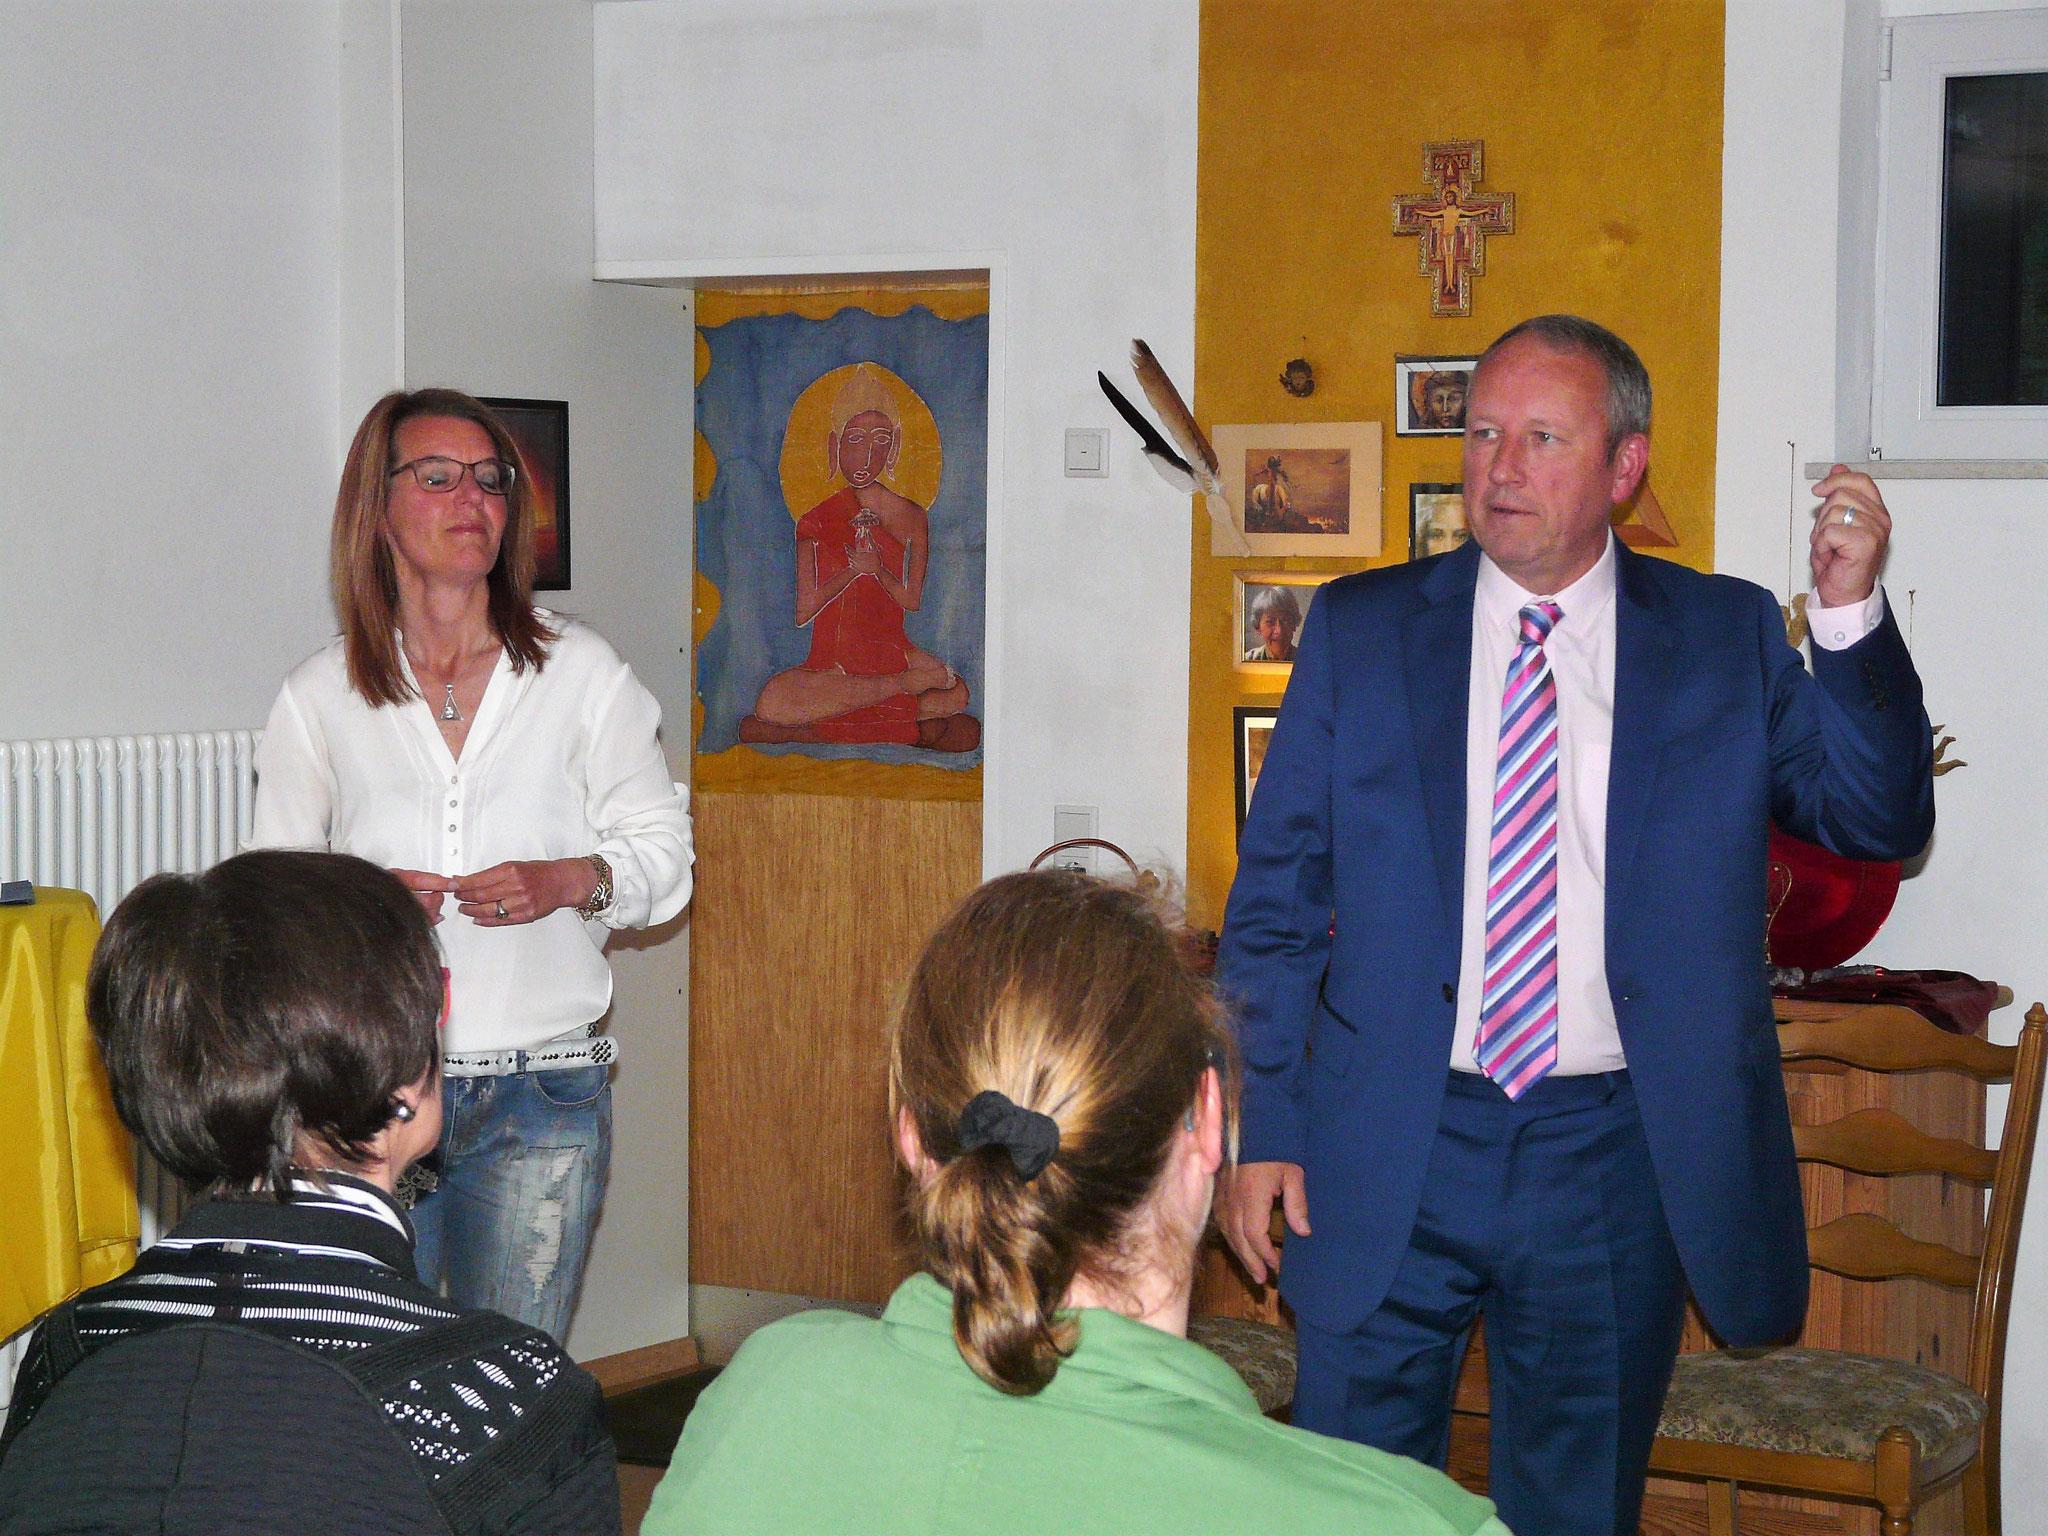 Claudia übersetzt Minister Bill Thomson